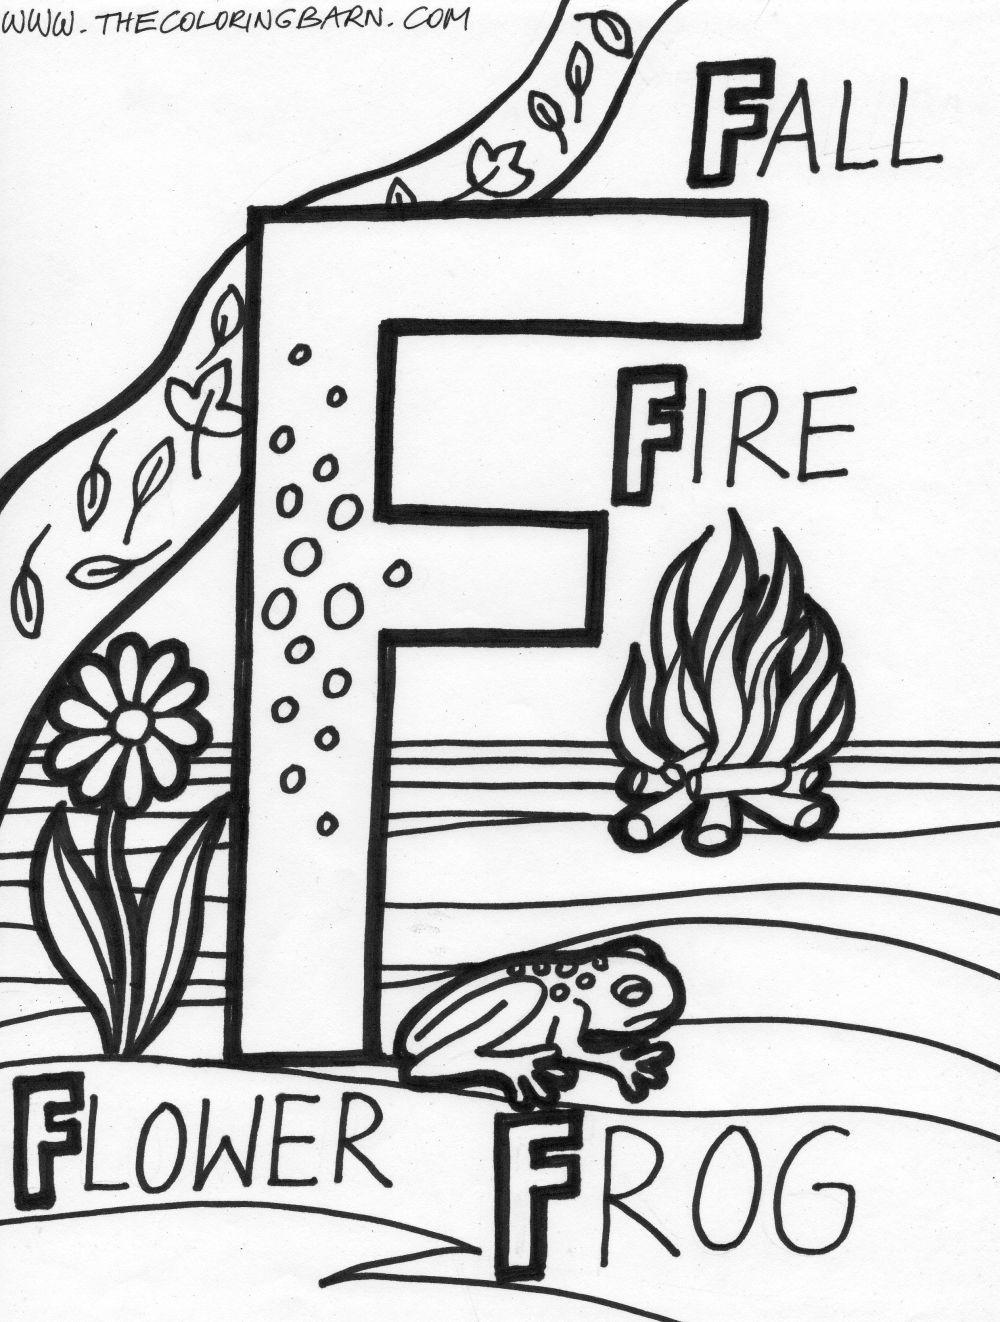 1000x1322 F For Fall, Fire, Flower, Frog Alphabet F Flower Frog